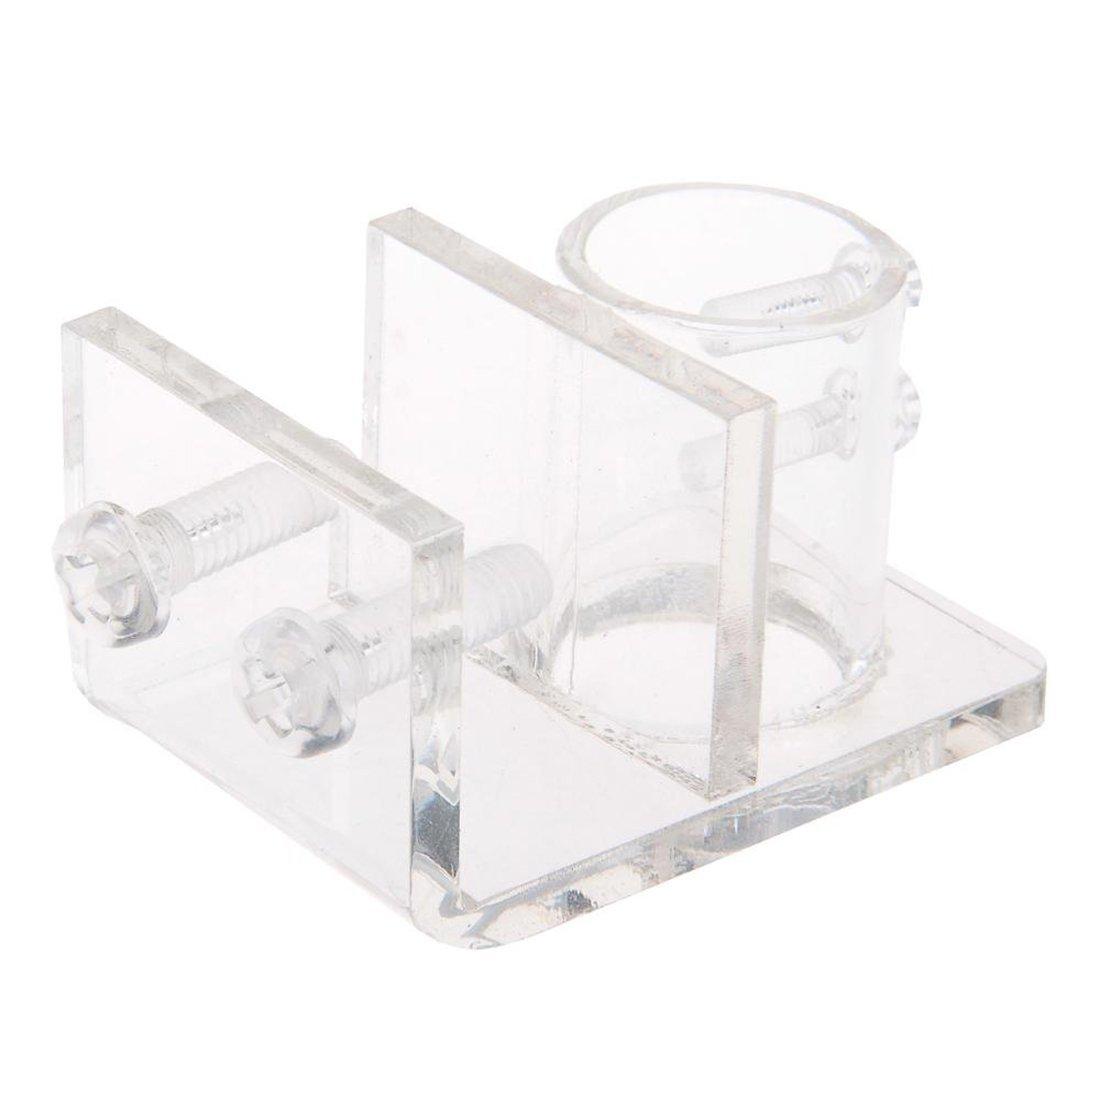 Support en Acrylique Pince Clip pour Aquarium Fish Tank ASTrade TRTA11A